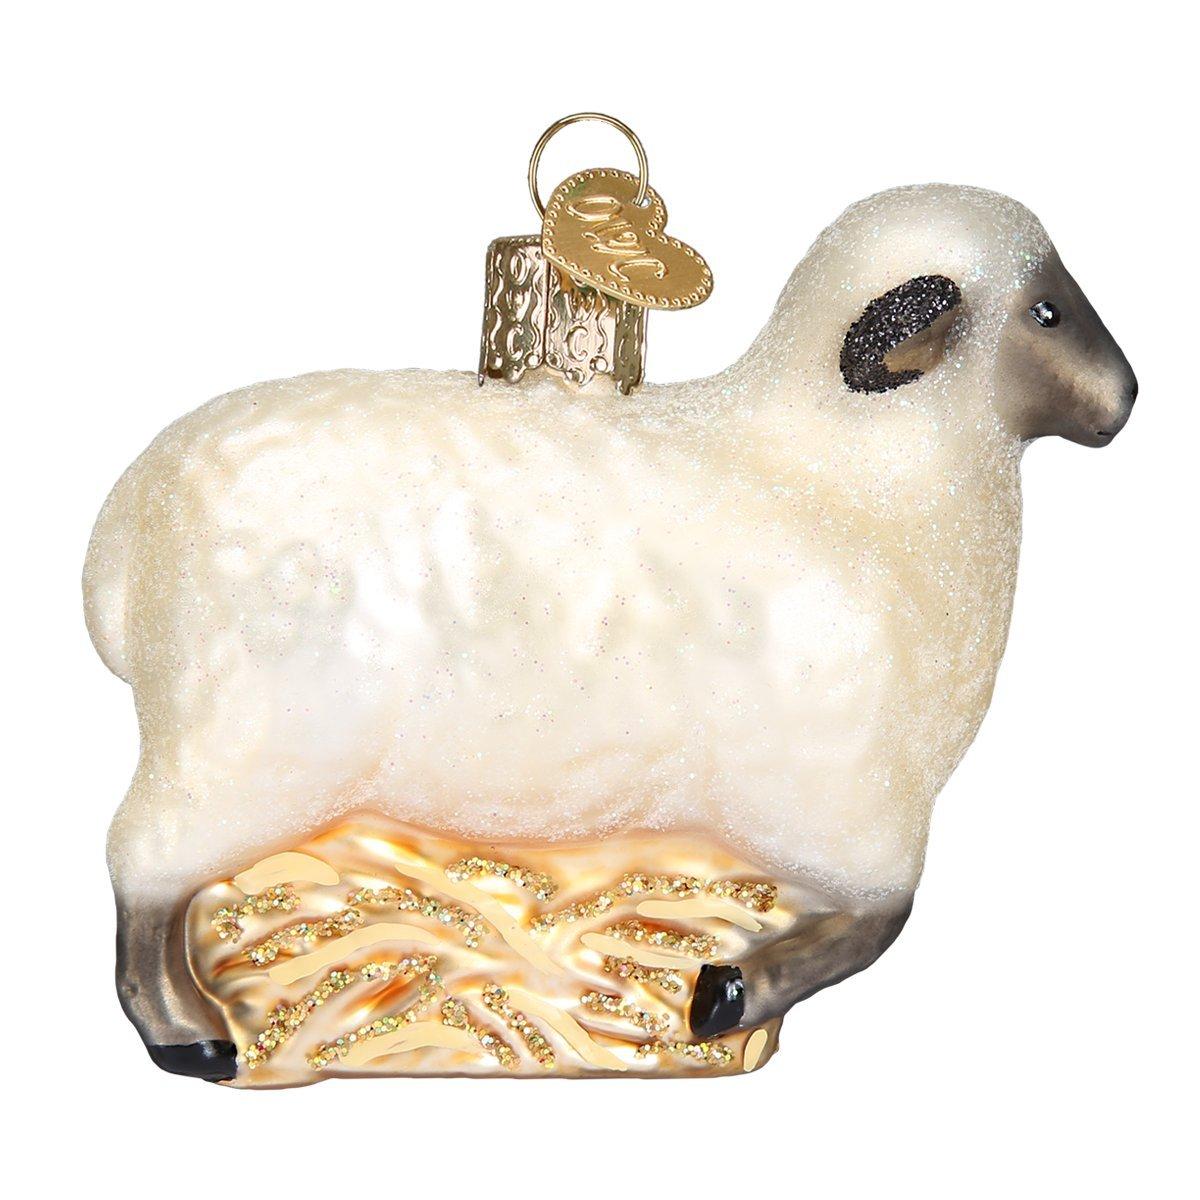 Old World Christmas Ornaments: Sheep